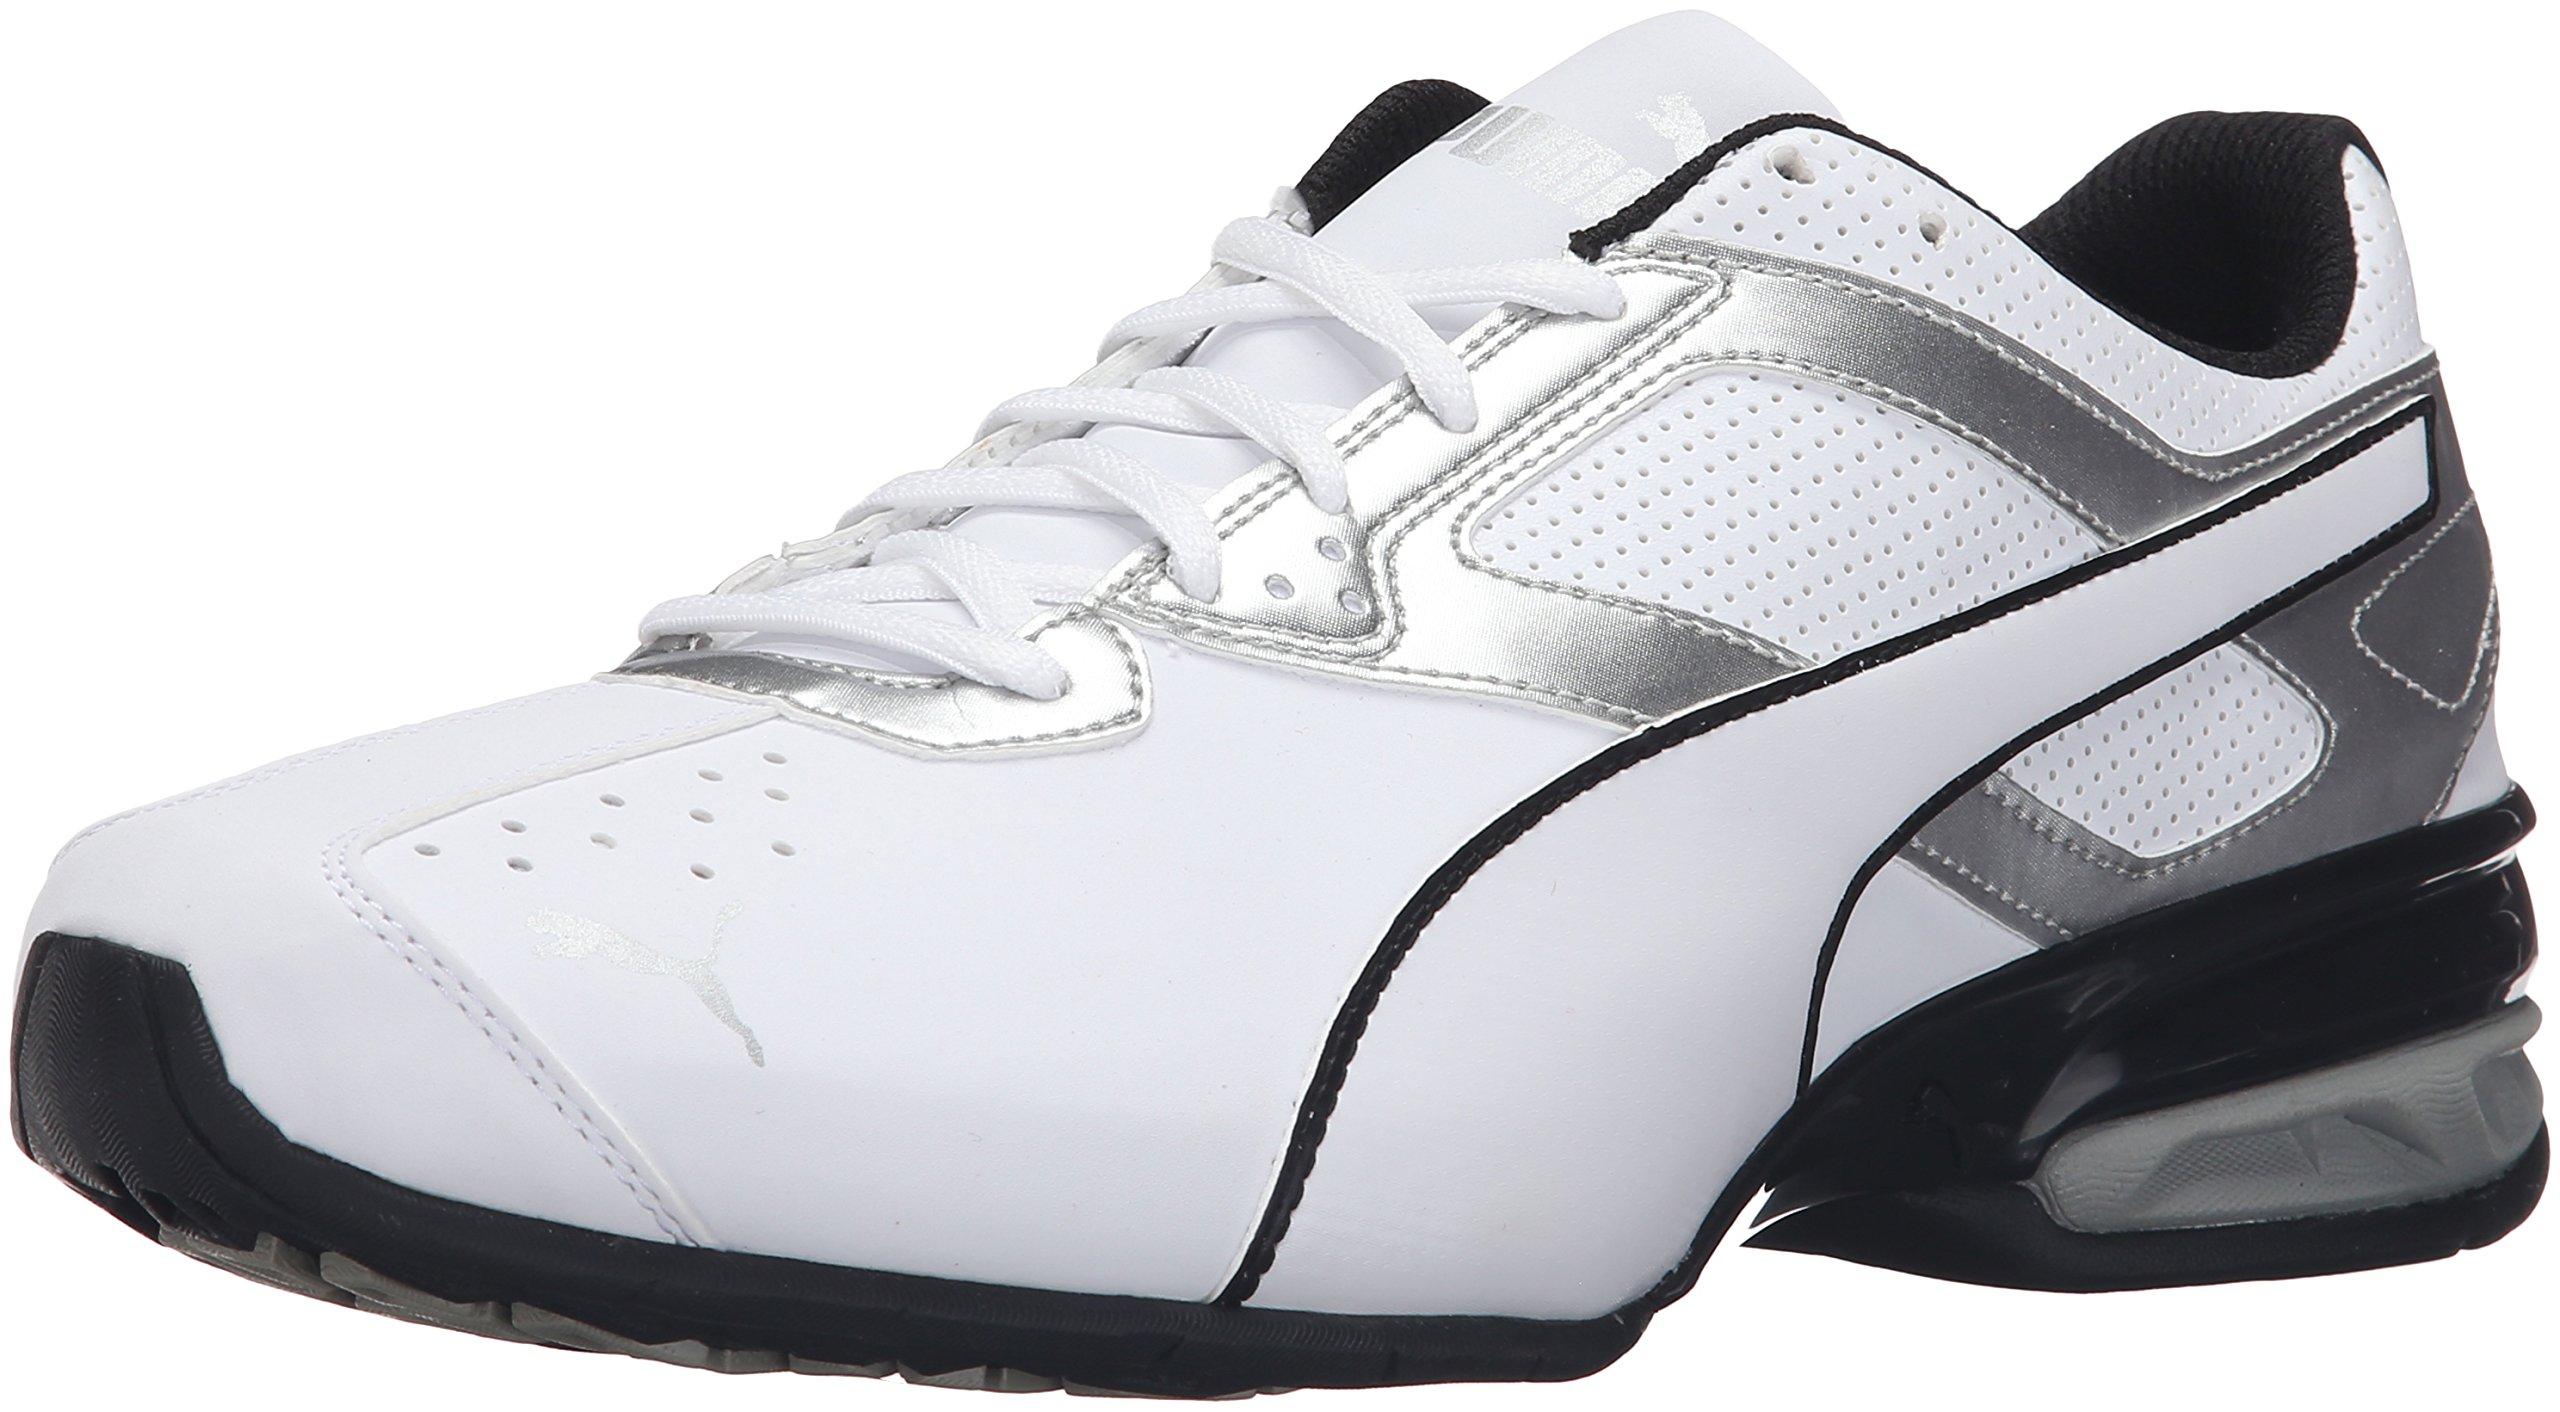 PUMA Men's Tazon 6 FM Puma White/ Puma Silver Running Shoe - 12 D(M) US